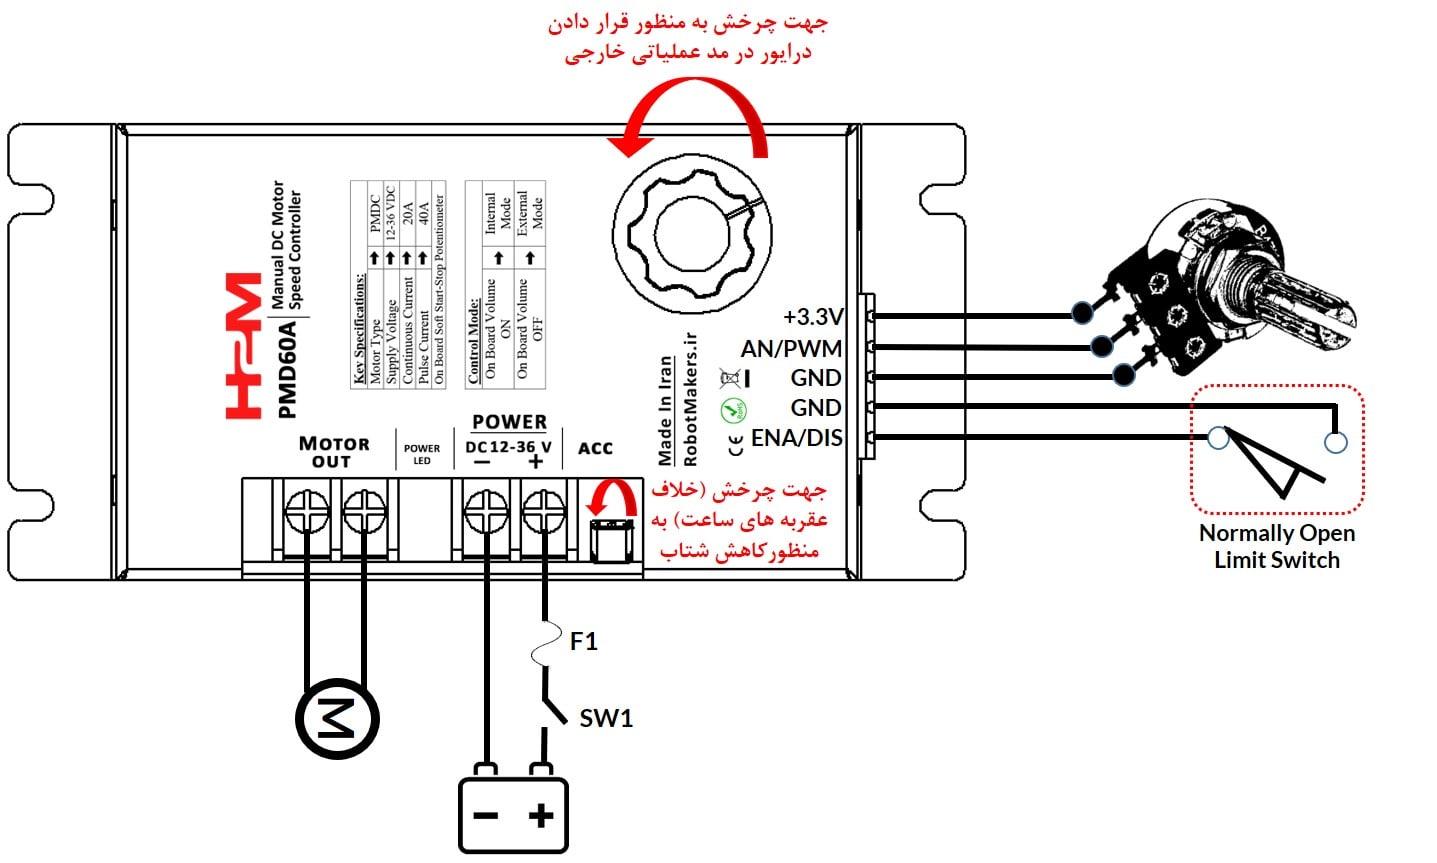 شکل ۶: کنترل سرعت موتور به وسیله ولوم خارجی